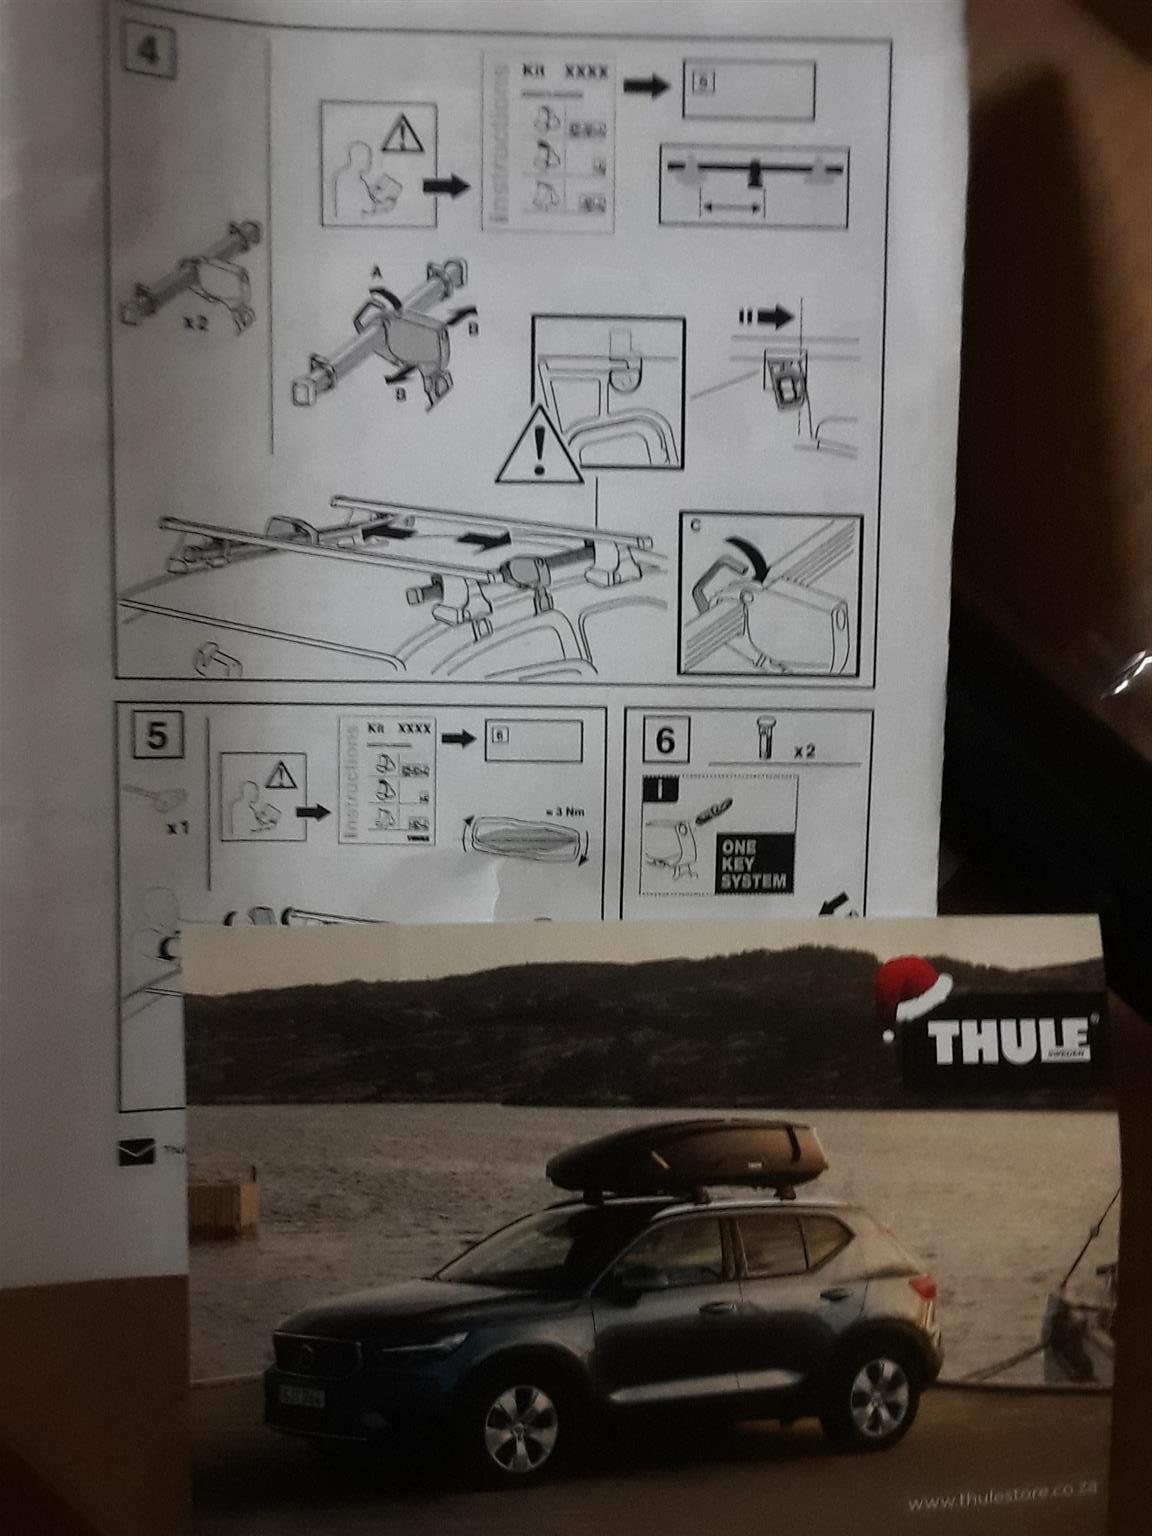 THULE short roof adapter 774